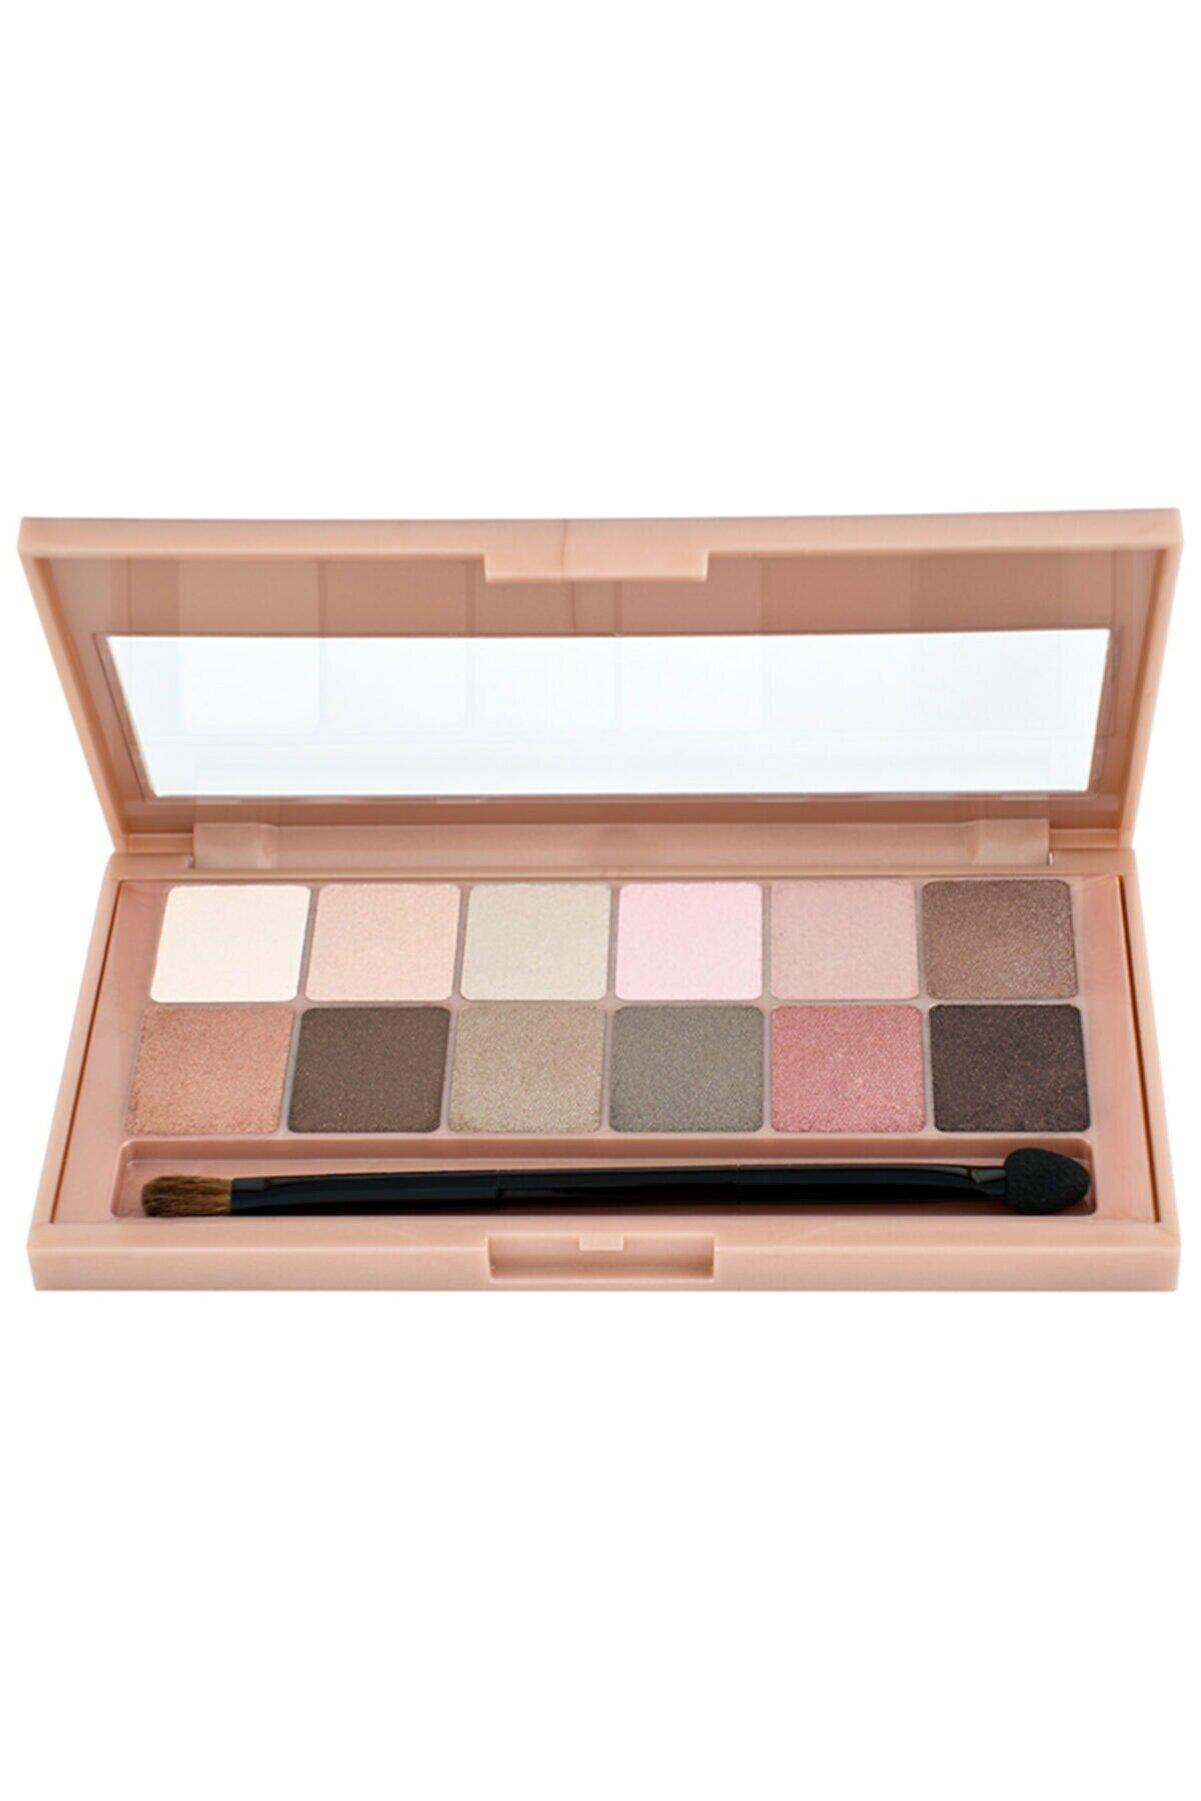 Maybelline New York Maybellıne The Blushed Nudes Eyeshadow Palette Far Paleti 12 Li